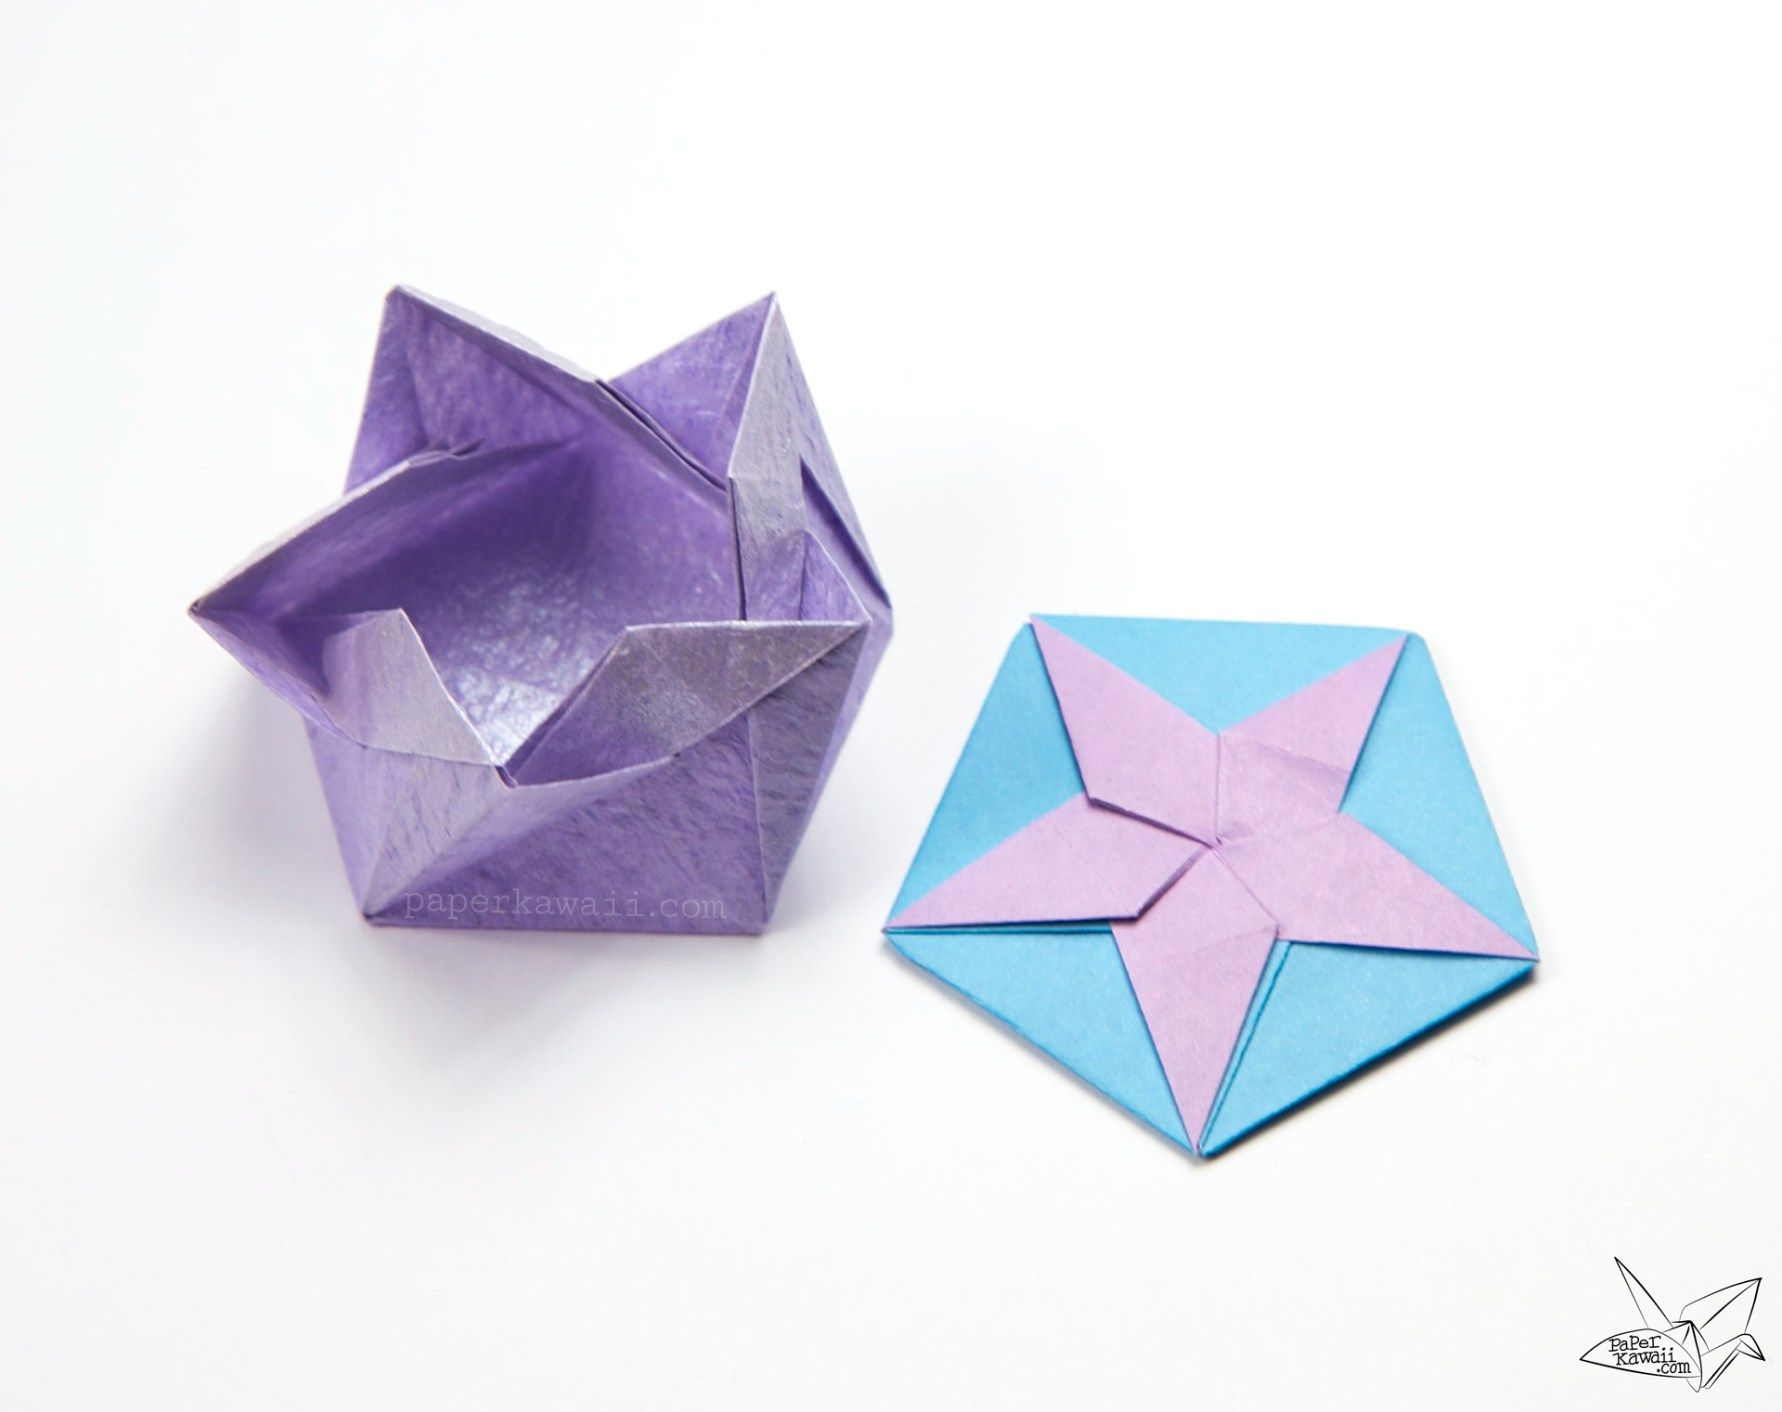 Modular origami star tutorial salman ebrahimi modular origami make a pretty modular origami star designed by salman ebrahimi this modular puffy star is jeuxipadfo Image collections